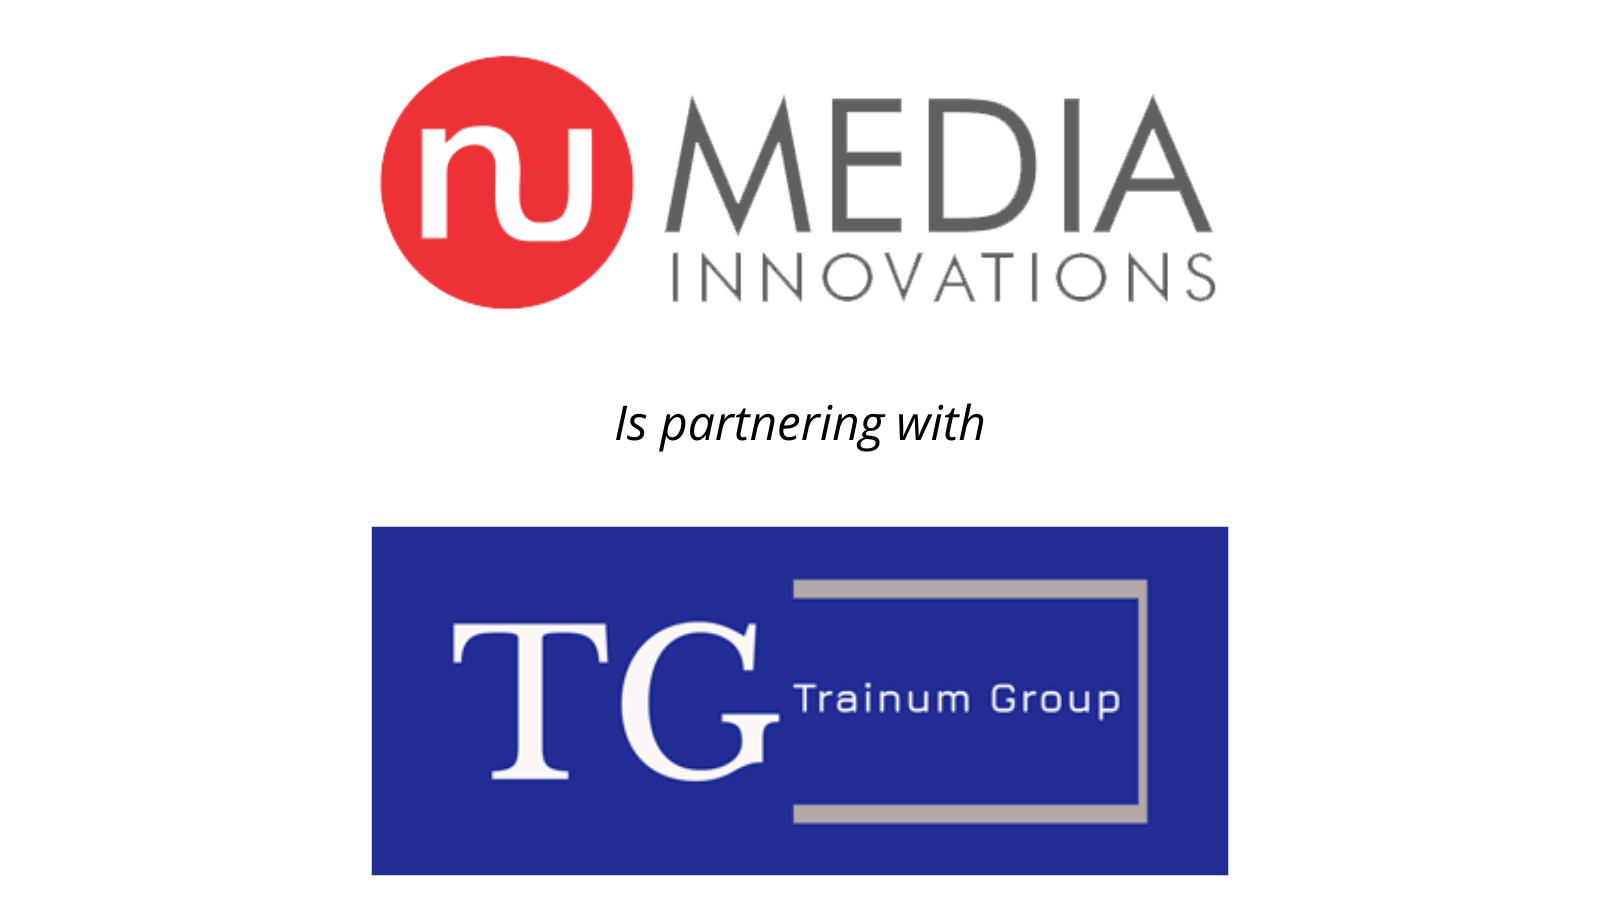 nuMedia Trainum partnership